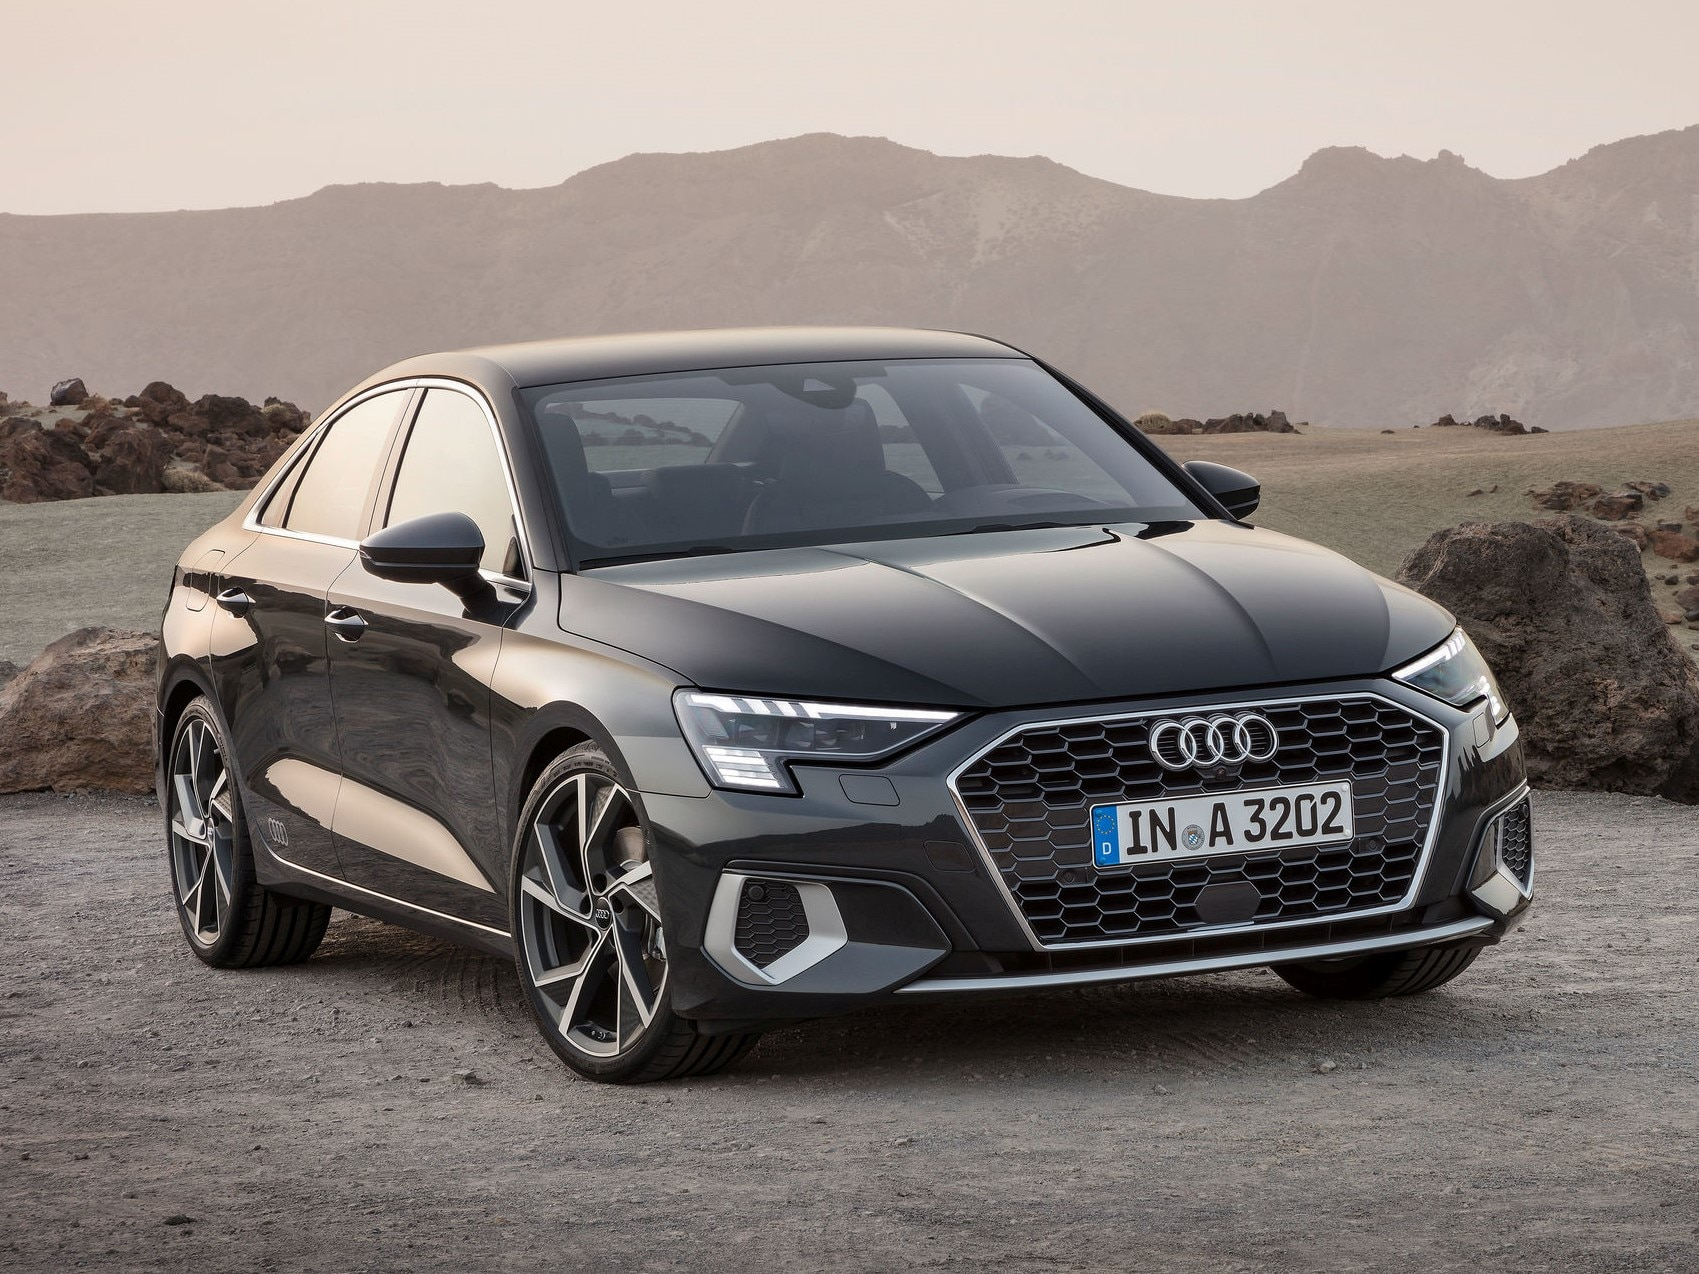 Audi Used Car Finance >> 2021 Audi A3 Sedan Unveiled Globally - ZigWheels